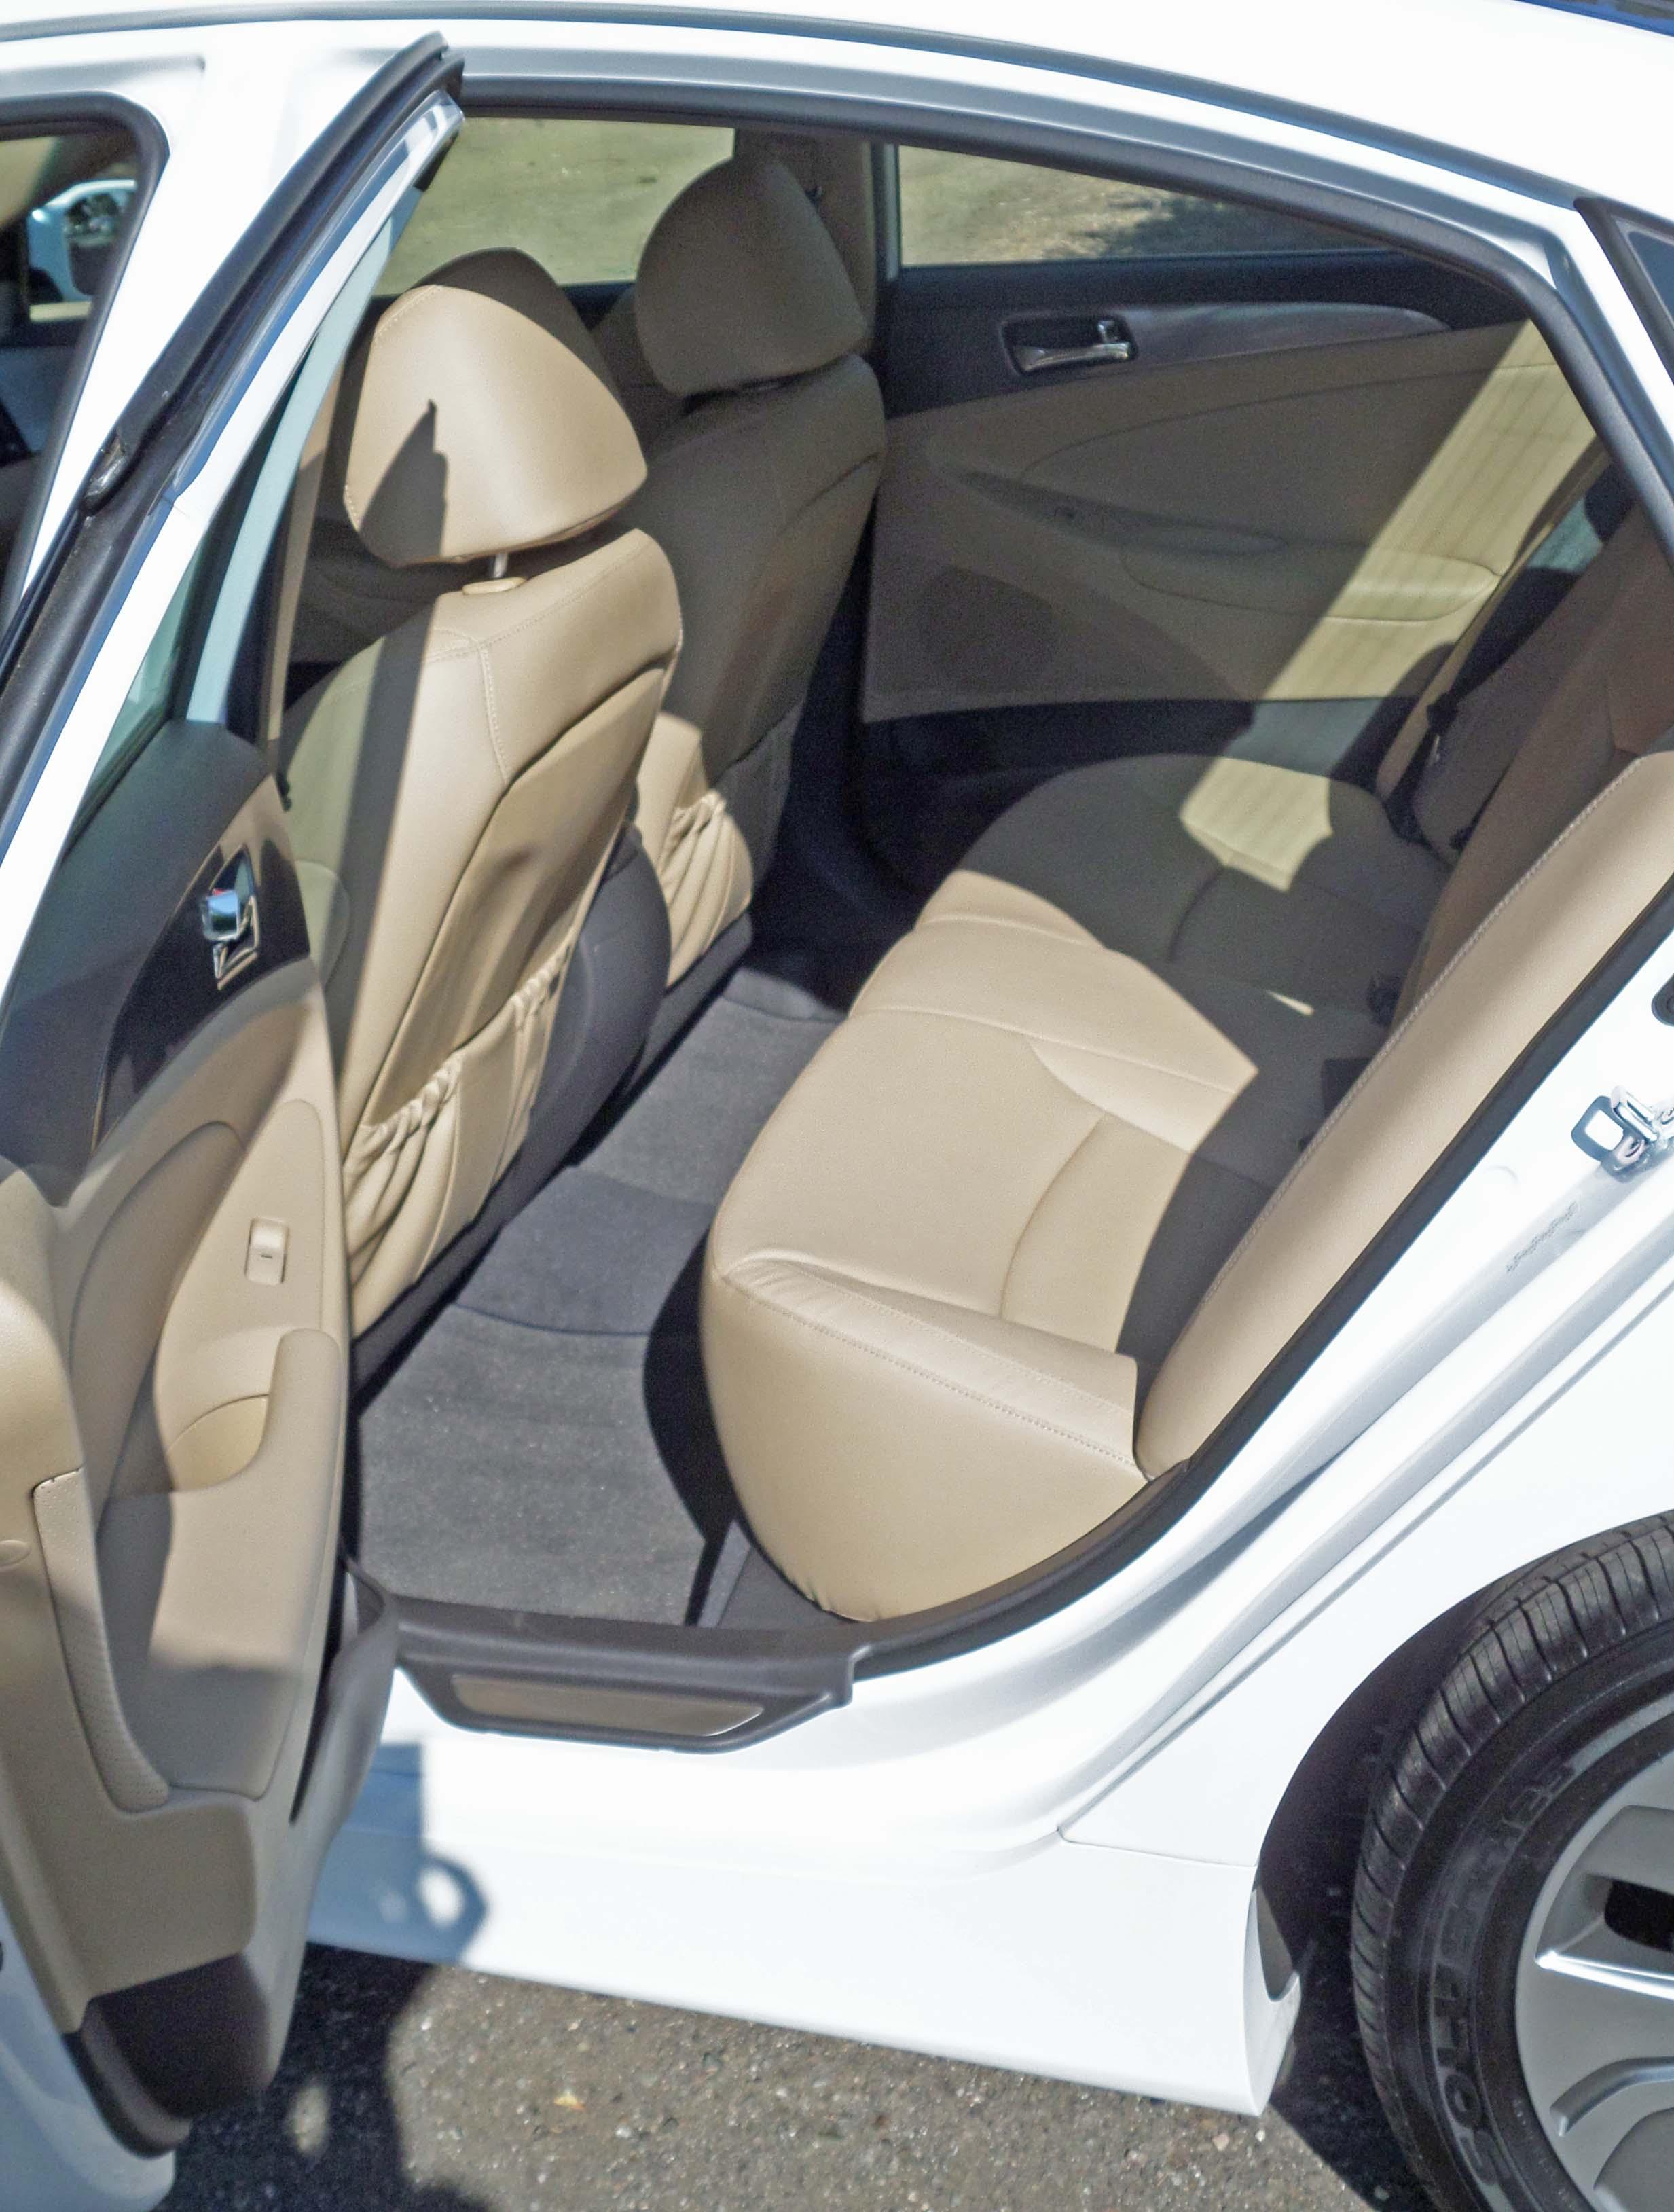 2014 Hyundai Sonata Hybrid Limited Test Drive   Our Auto Expert